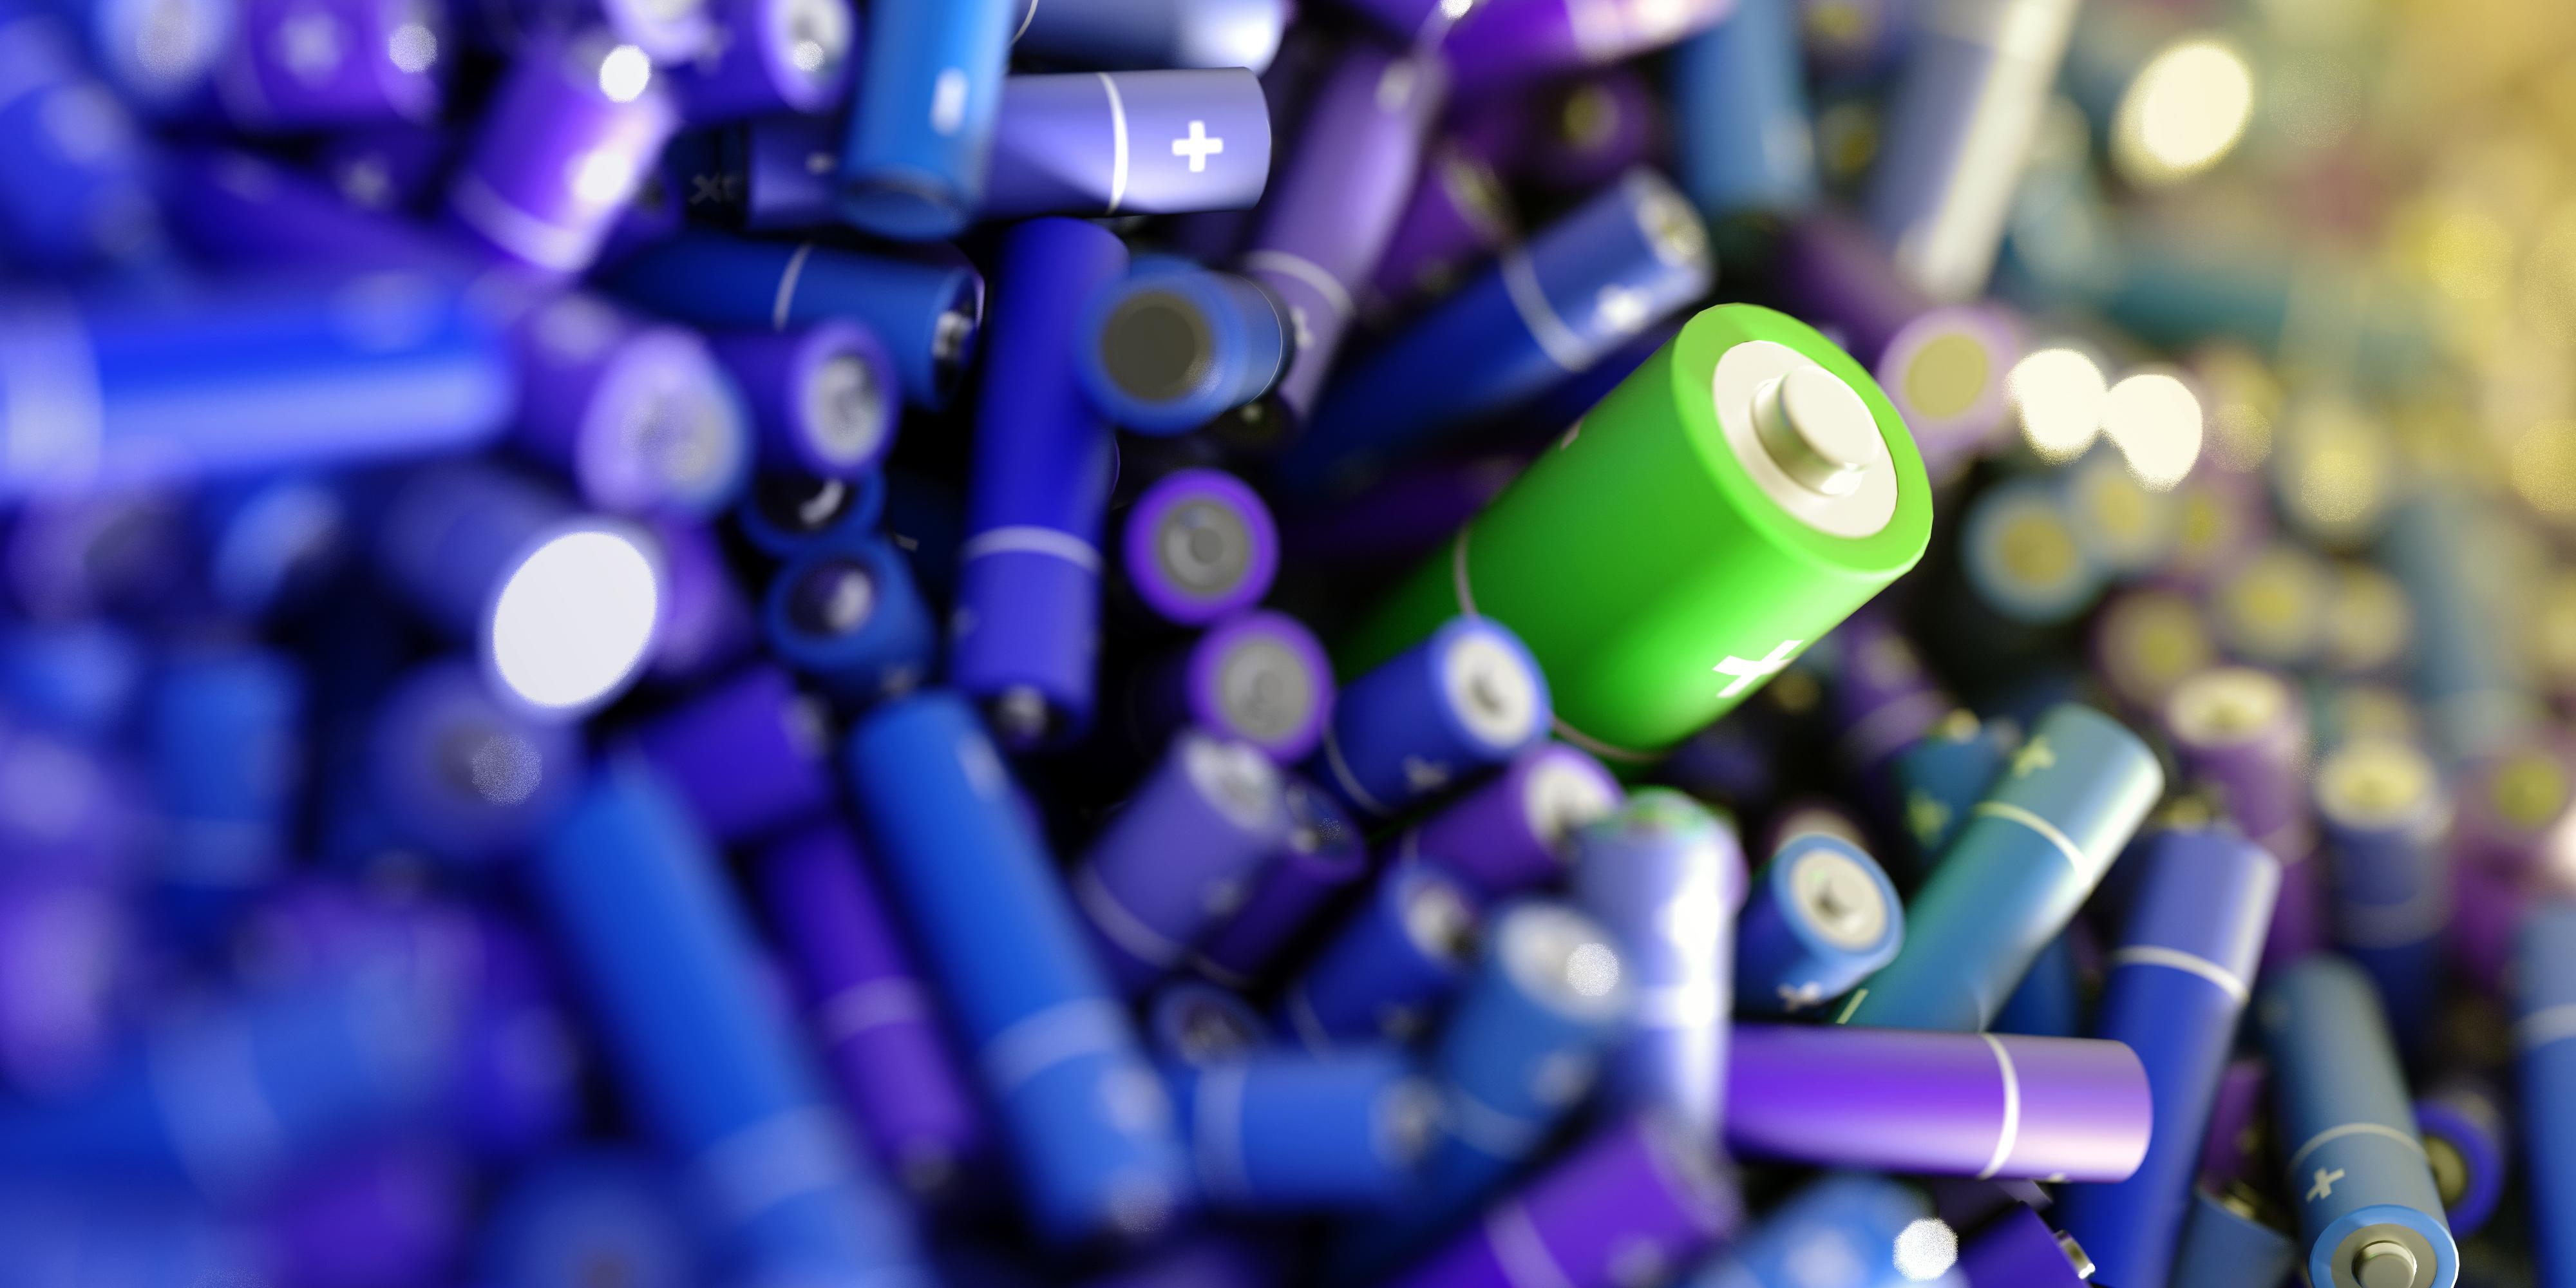 A pile of alkaline batteries